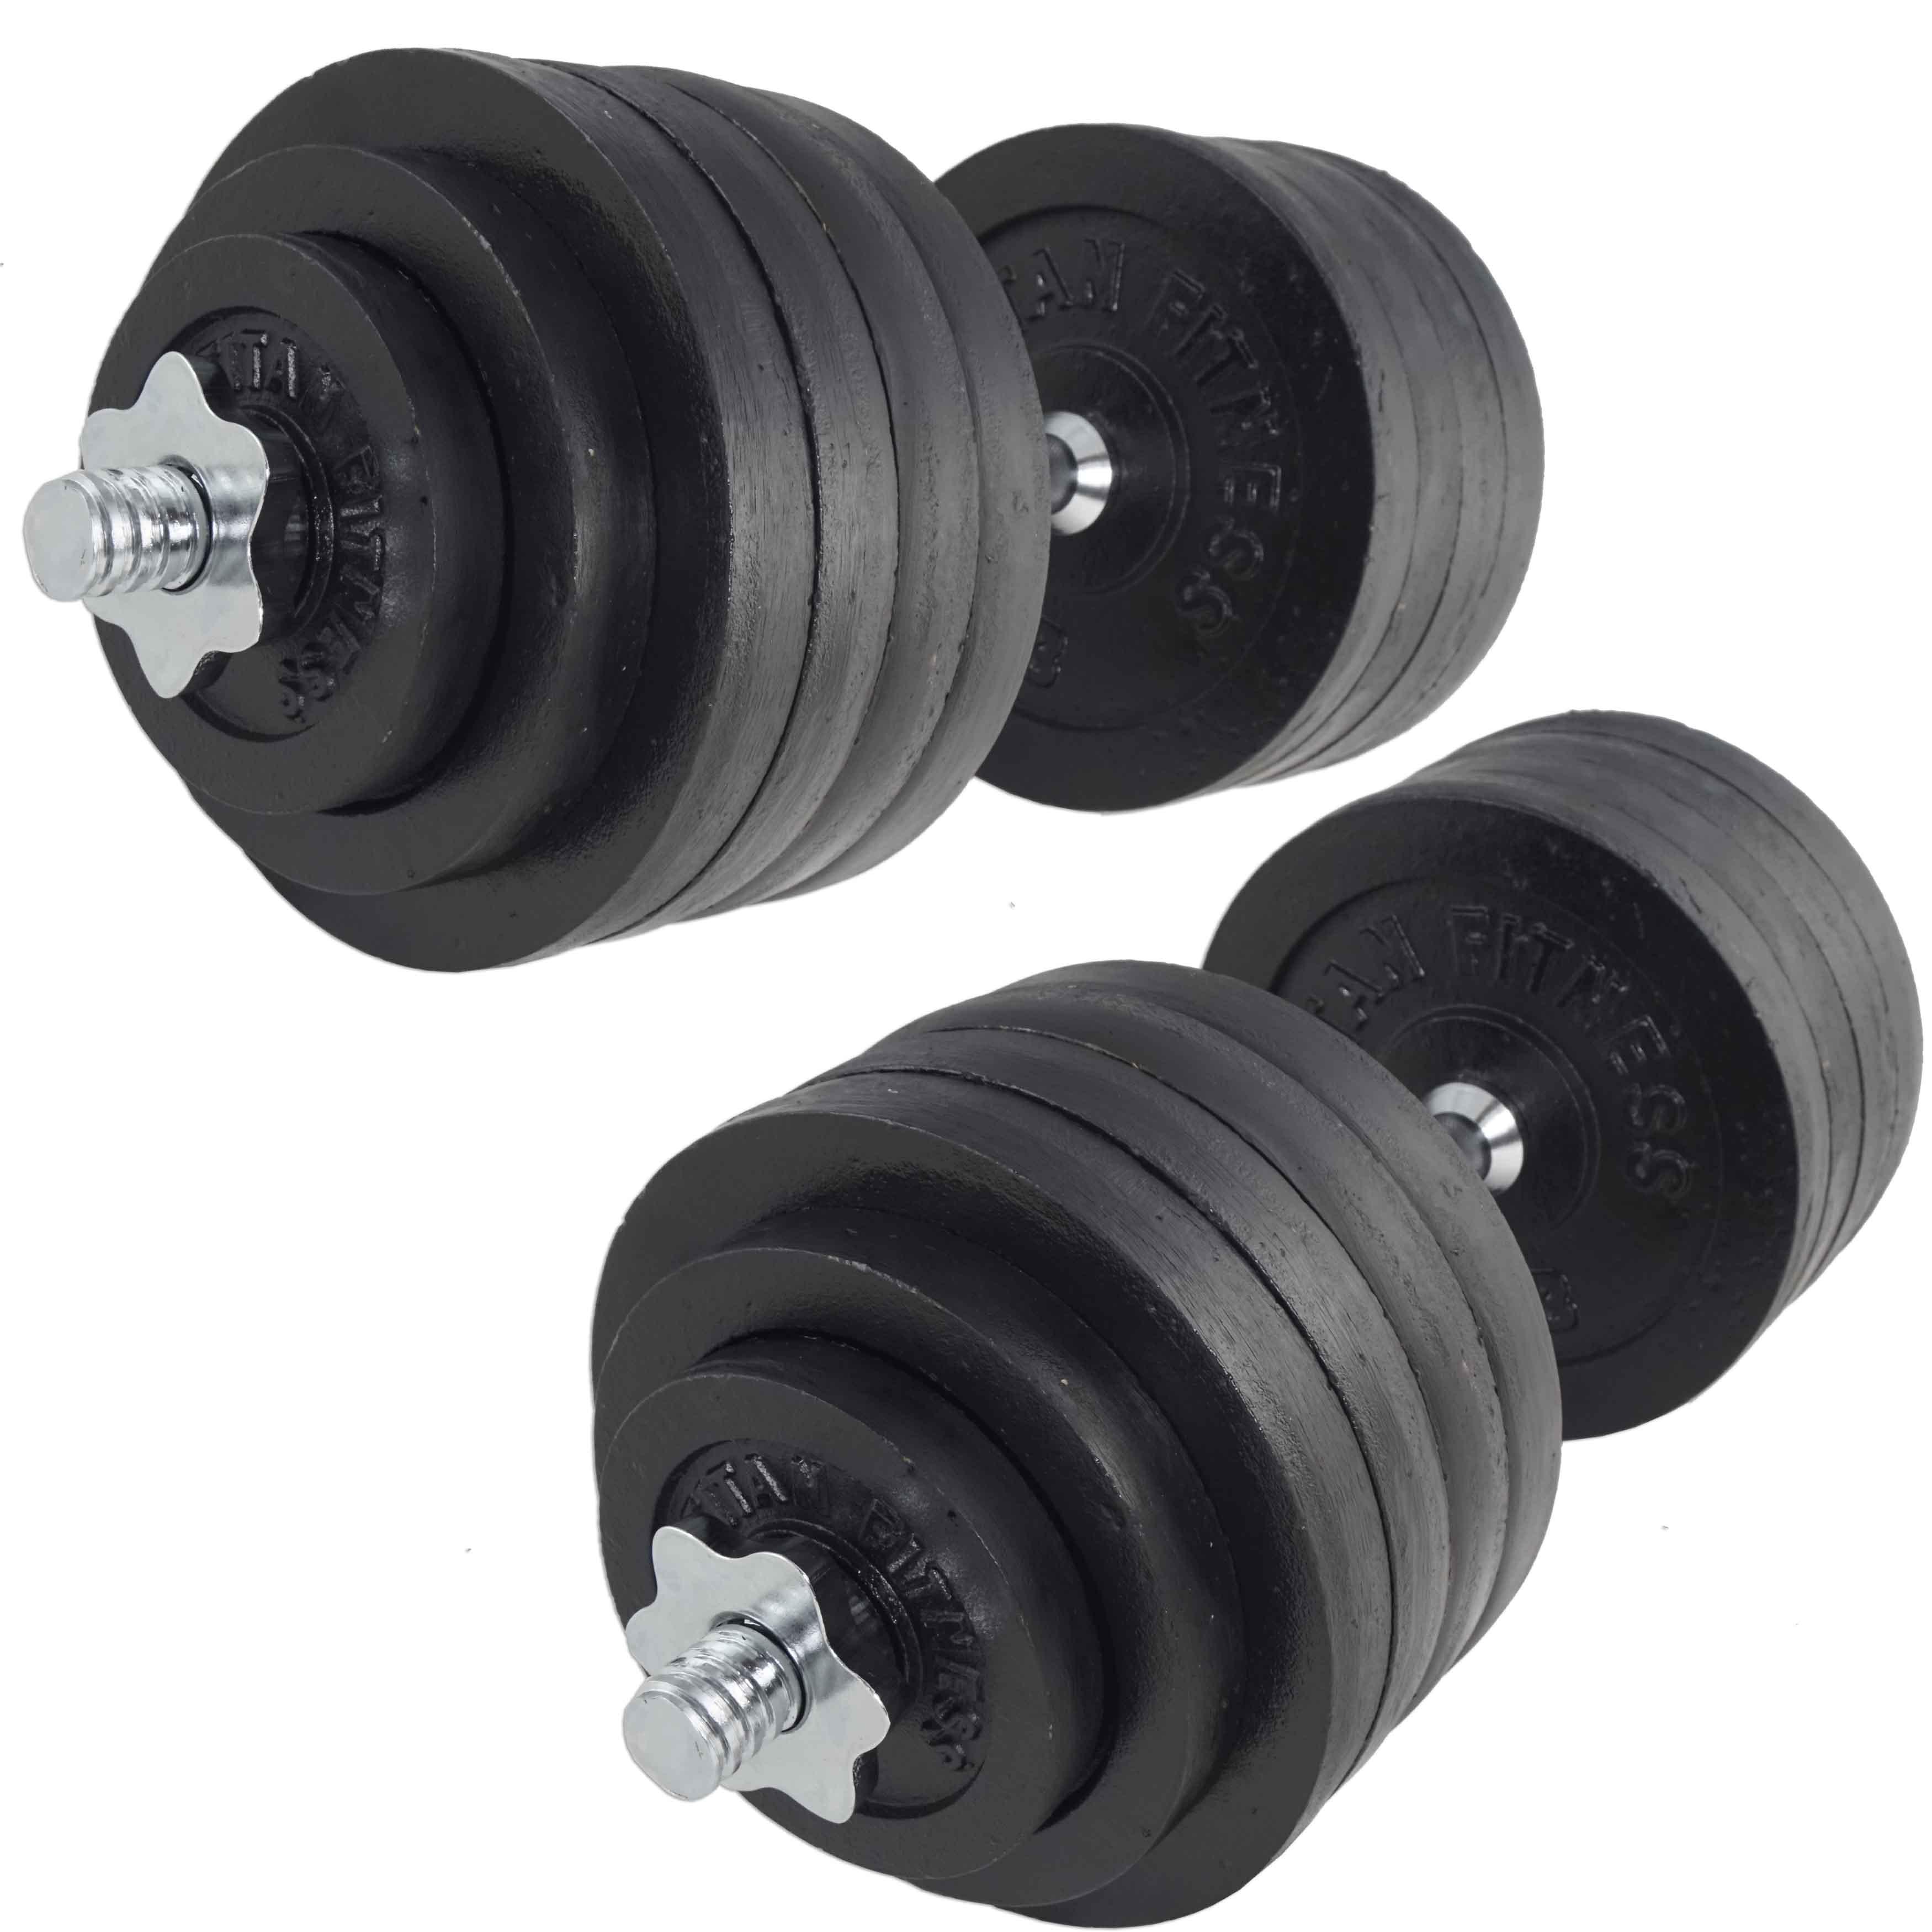 Adjustable 200 Lb Dumbbells: Pair Adjustable Cast Iron Dumbbells Weight 200 Lbs Kit Set